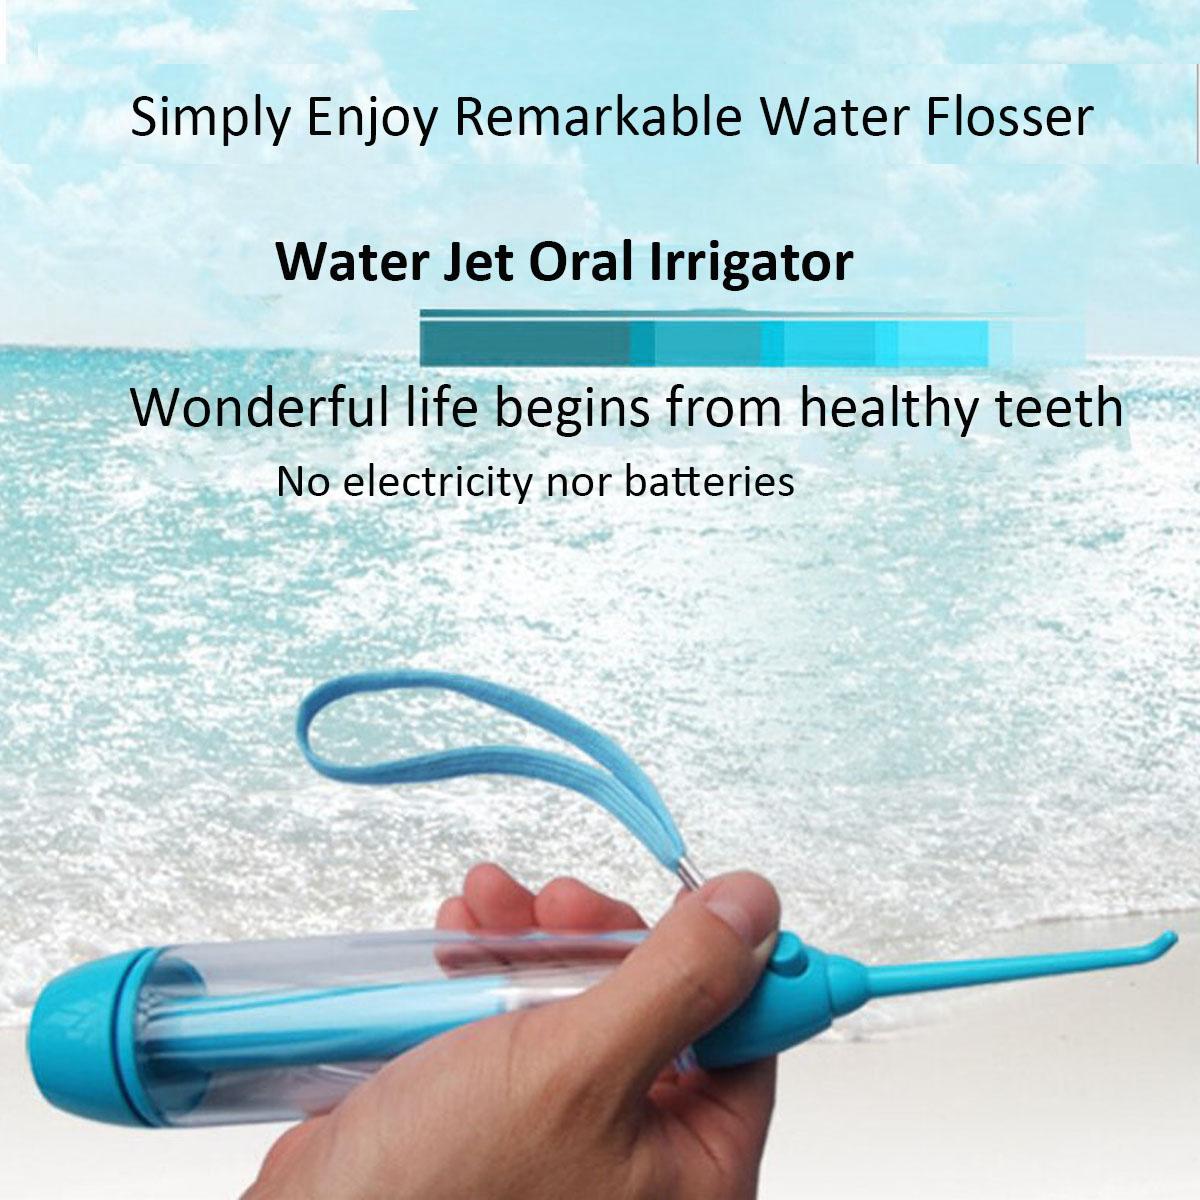 autoleader dental care water jet oral irrigator flosser tooth spa teeth pick cleaner health. Black Bedroom Furniture Sets. Home Design Ideas